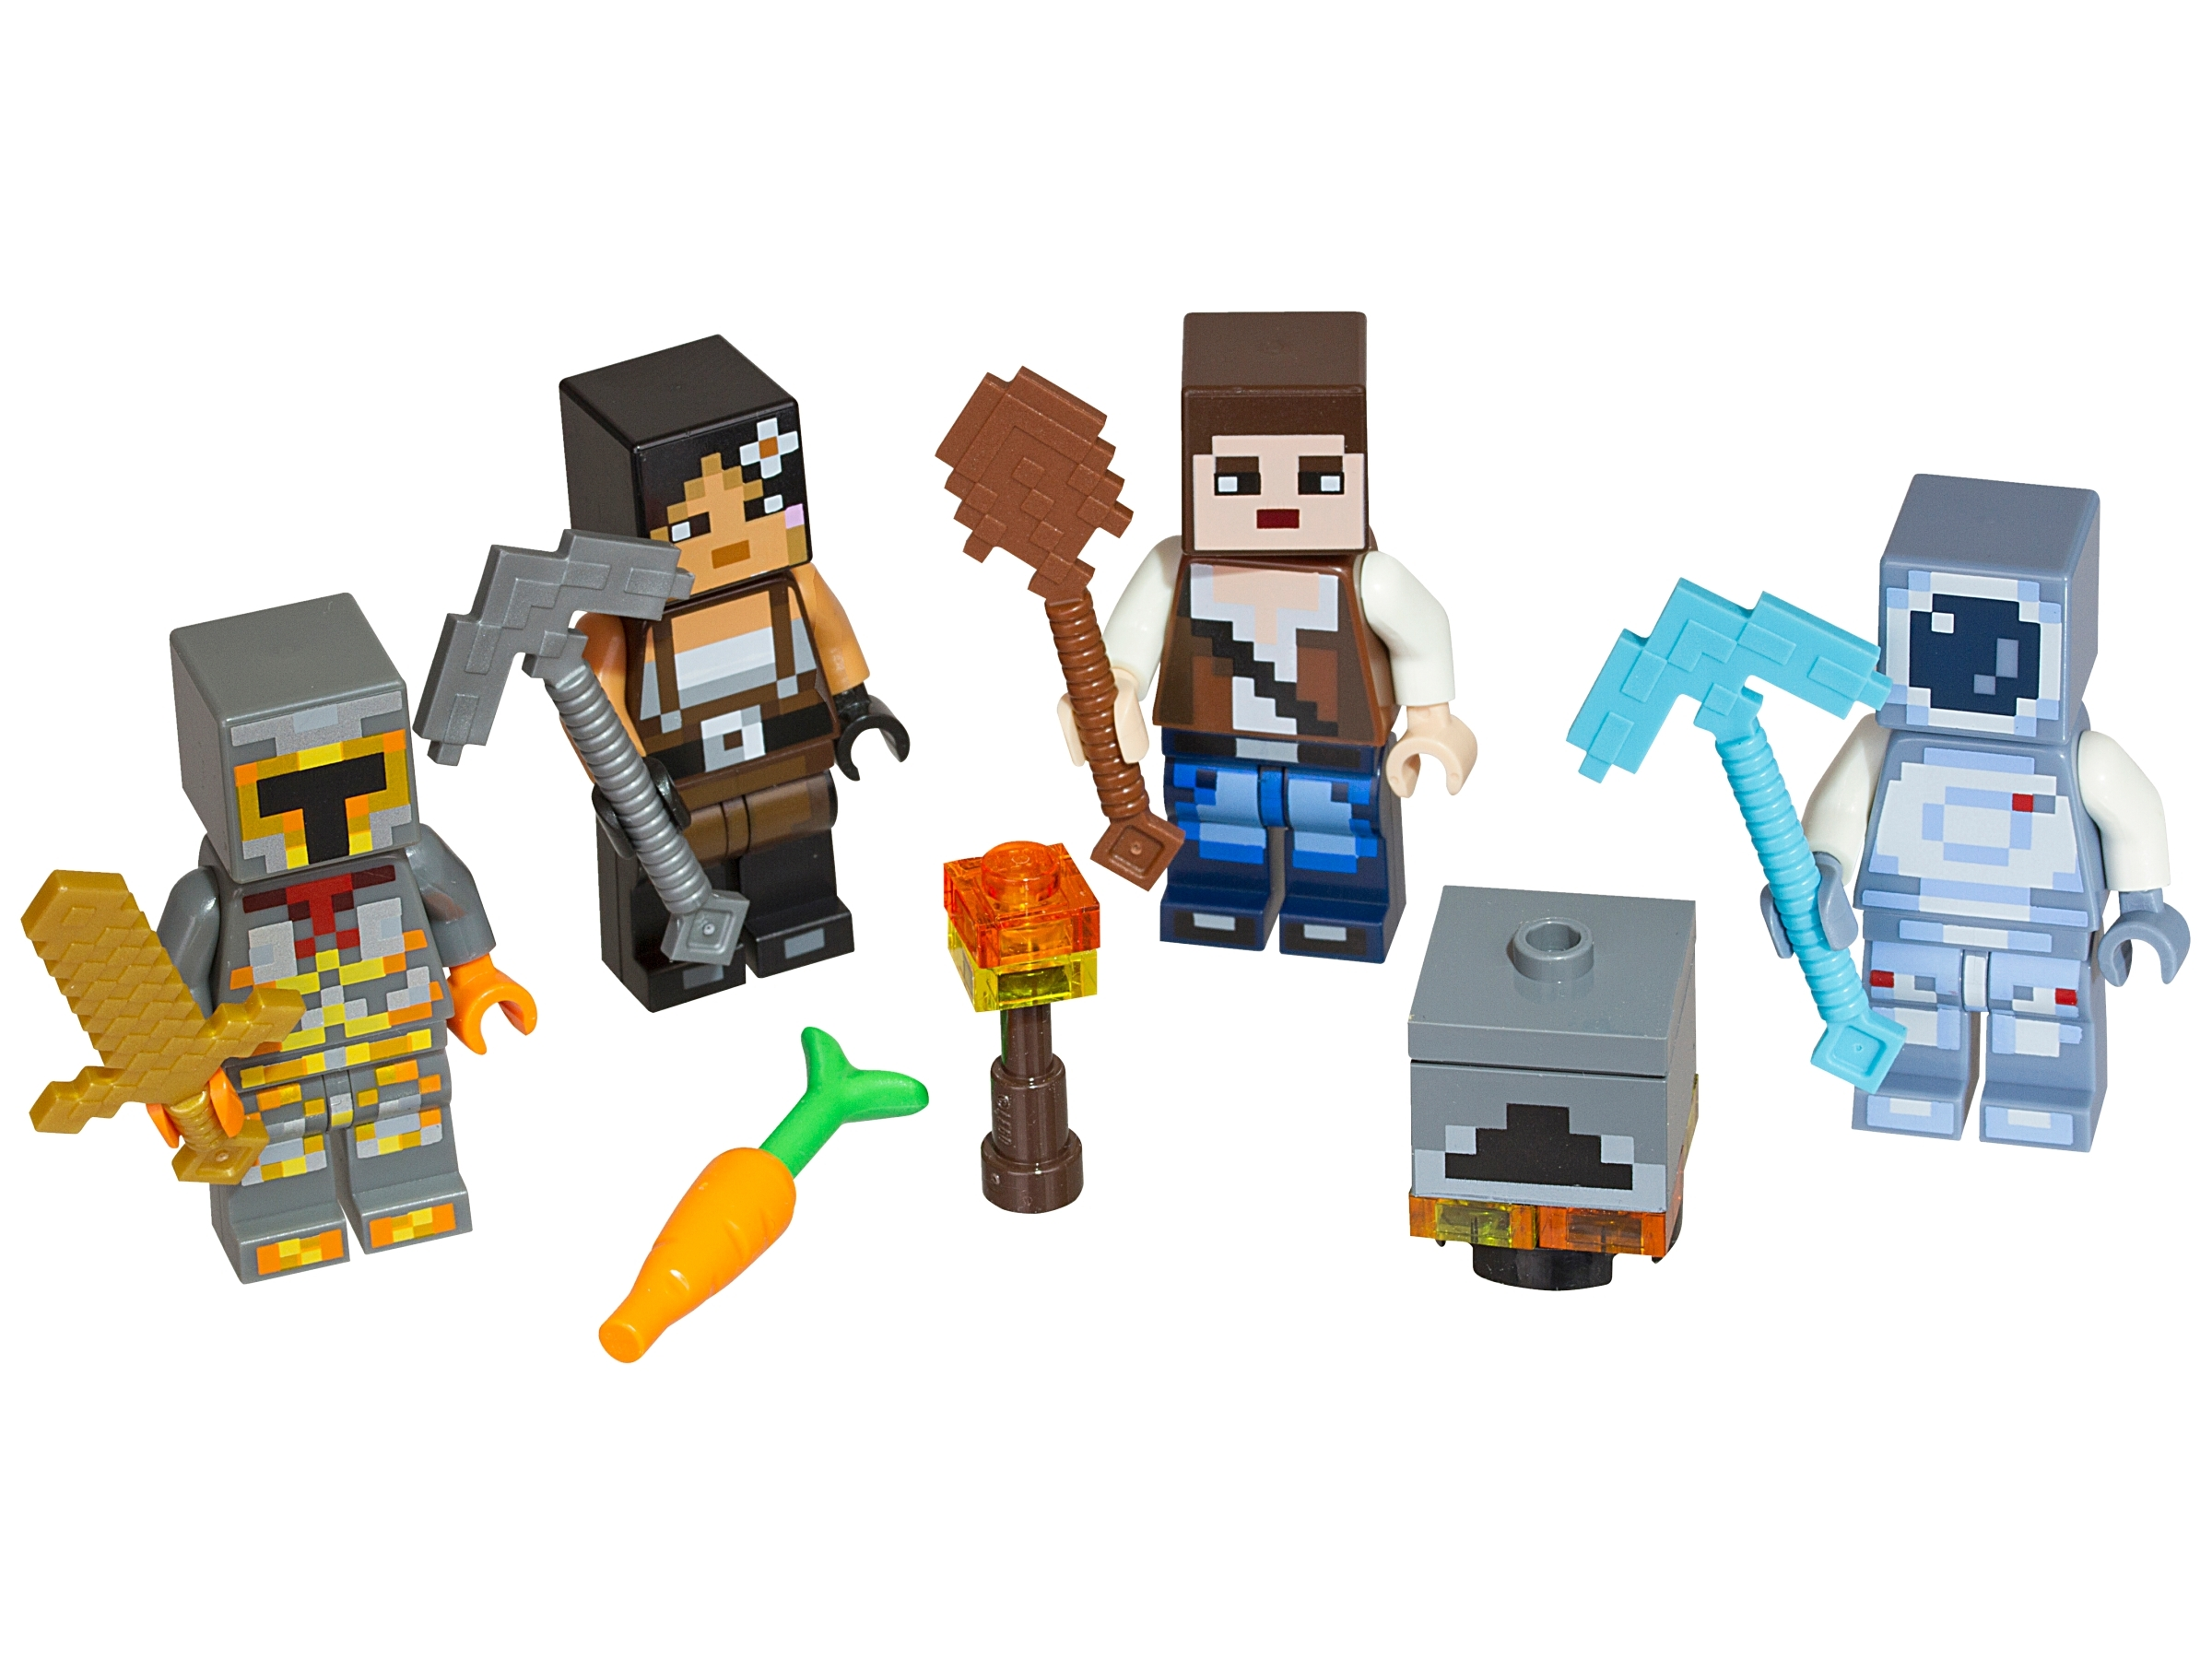 lego minecraft minifigures for sale